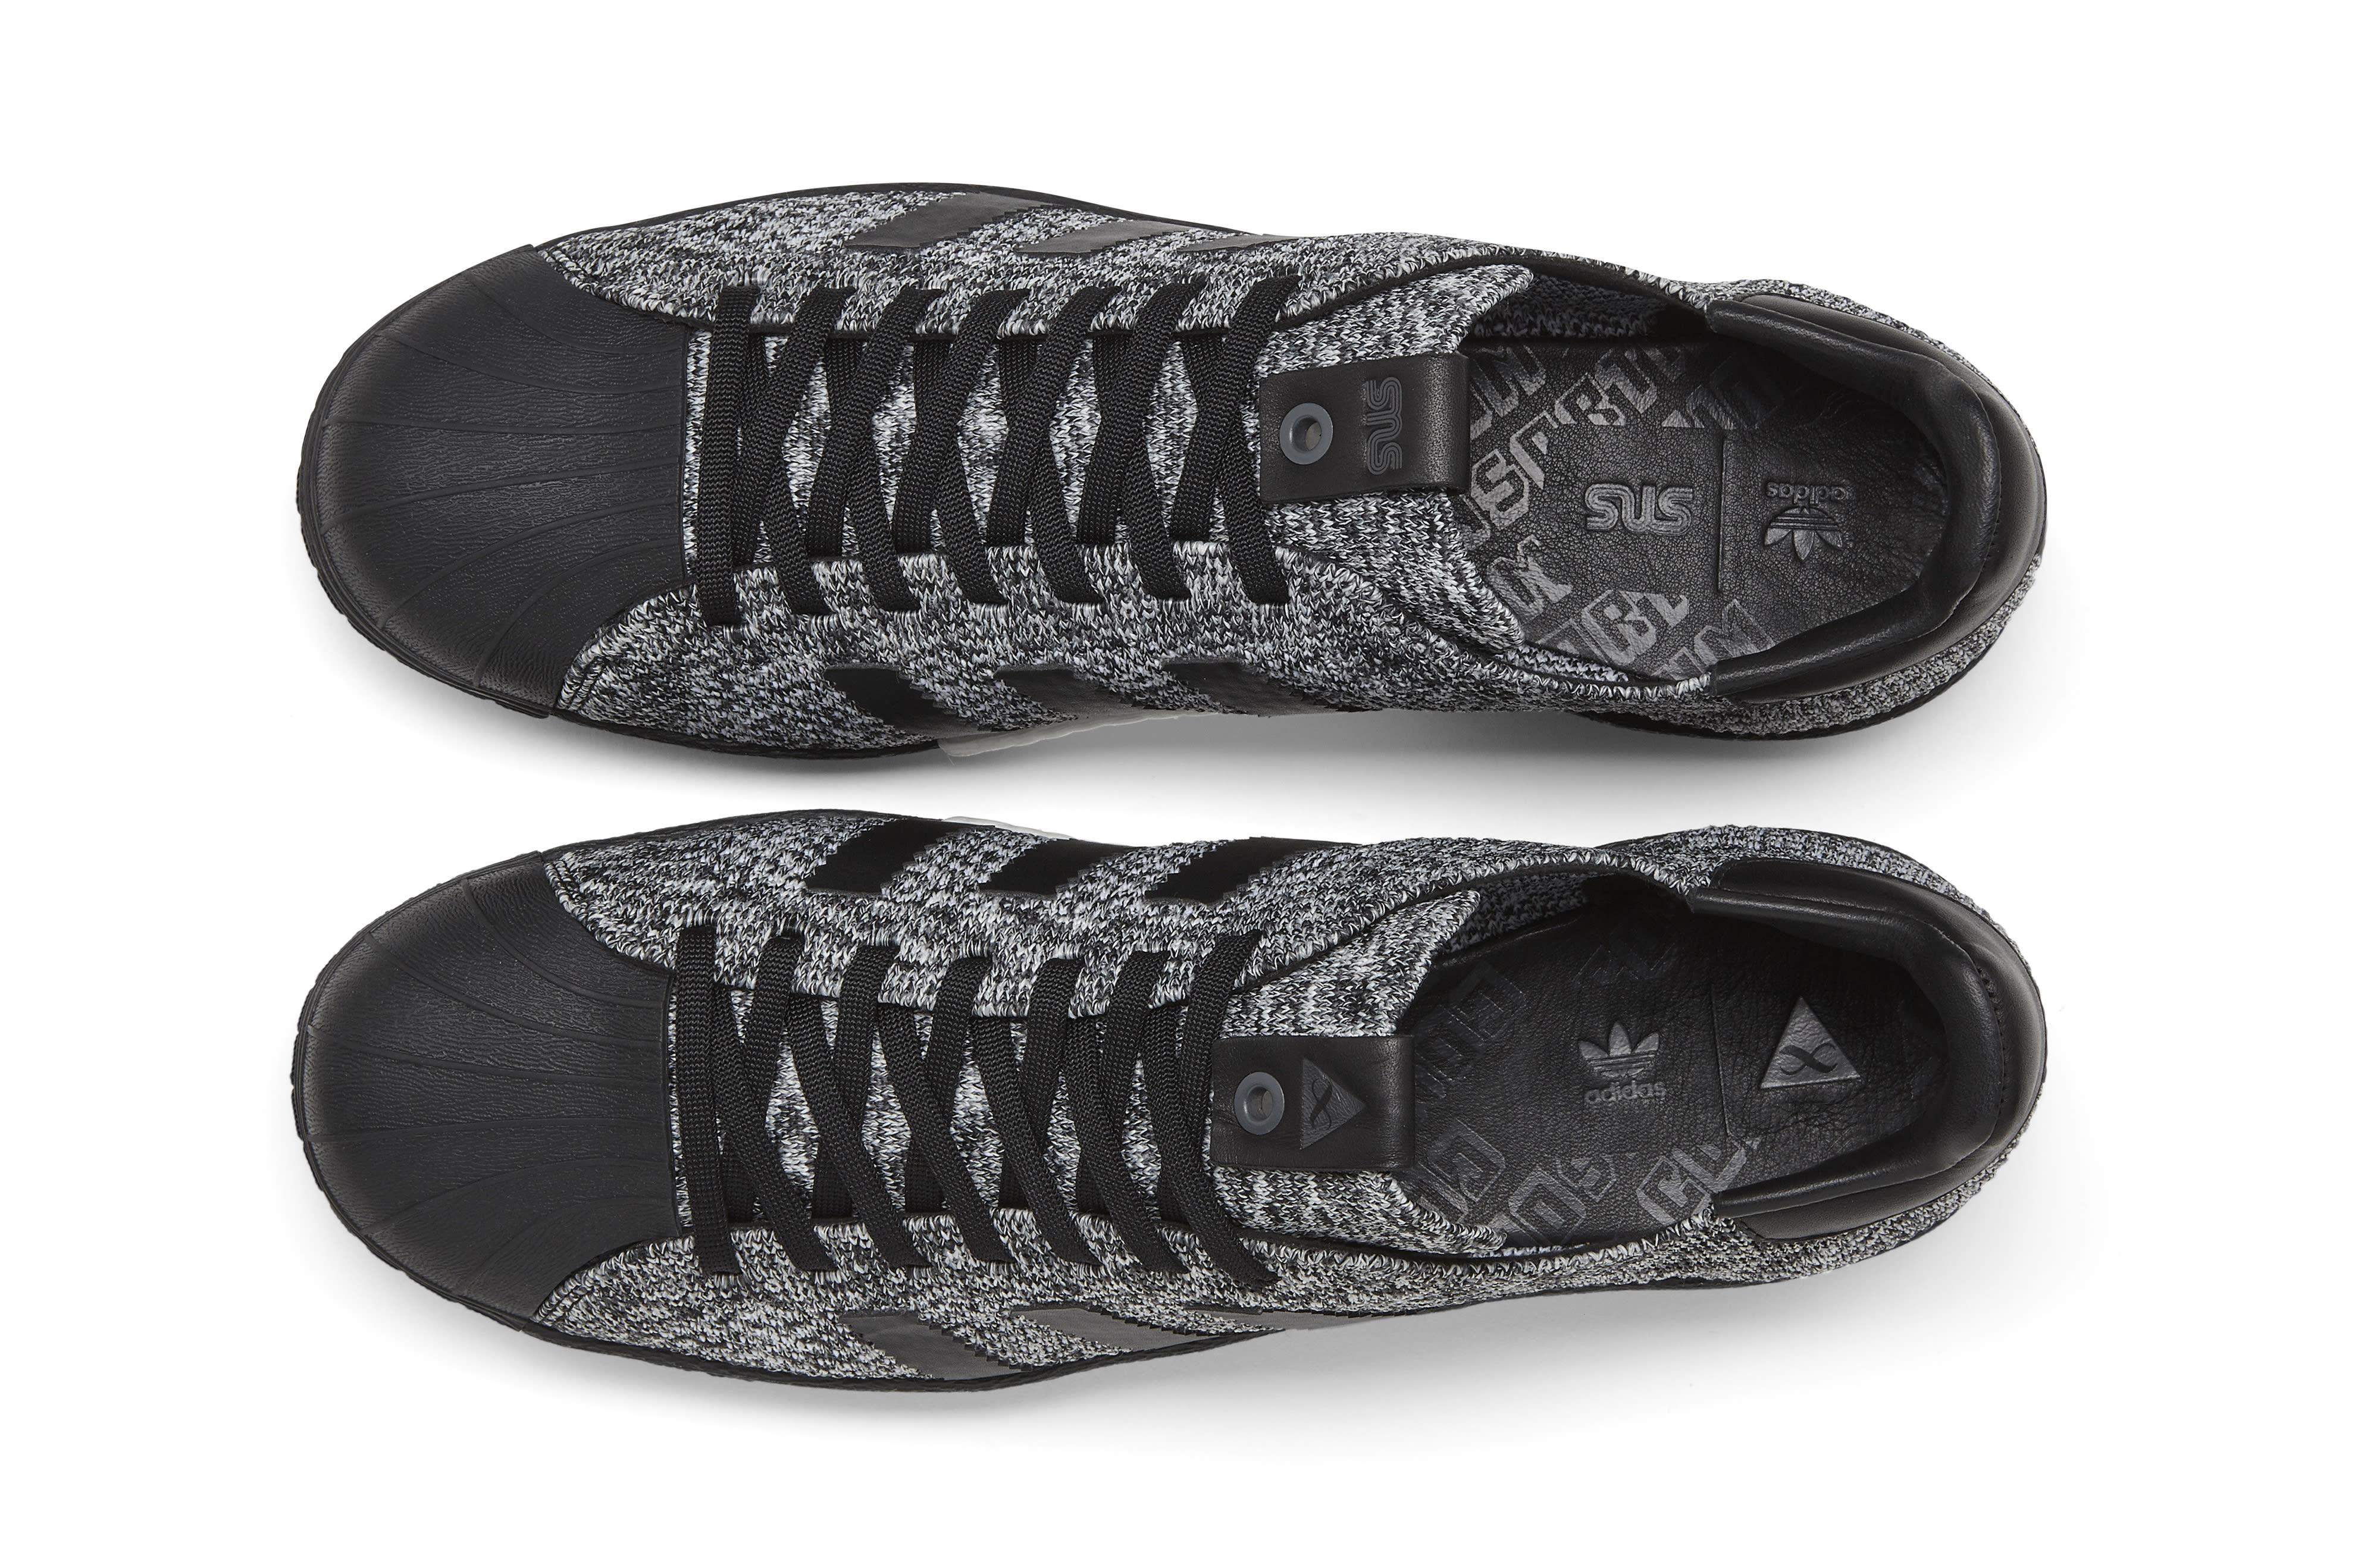 6f18b64e055cc Image via Adidas Sneakersnstuff Social Status Adidas Superstar Top